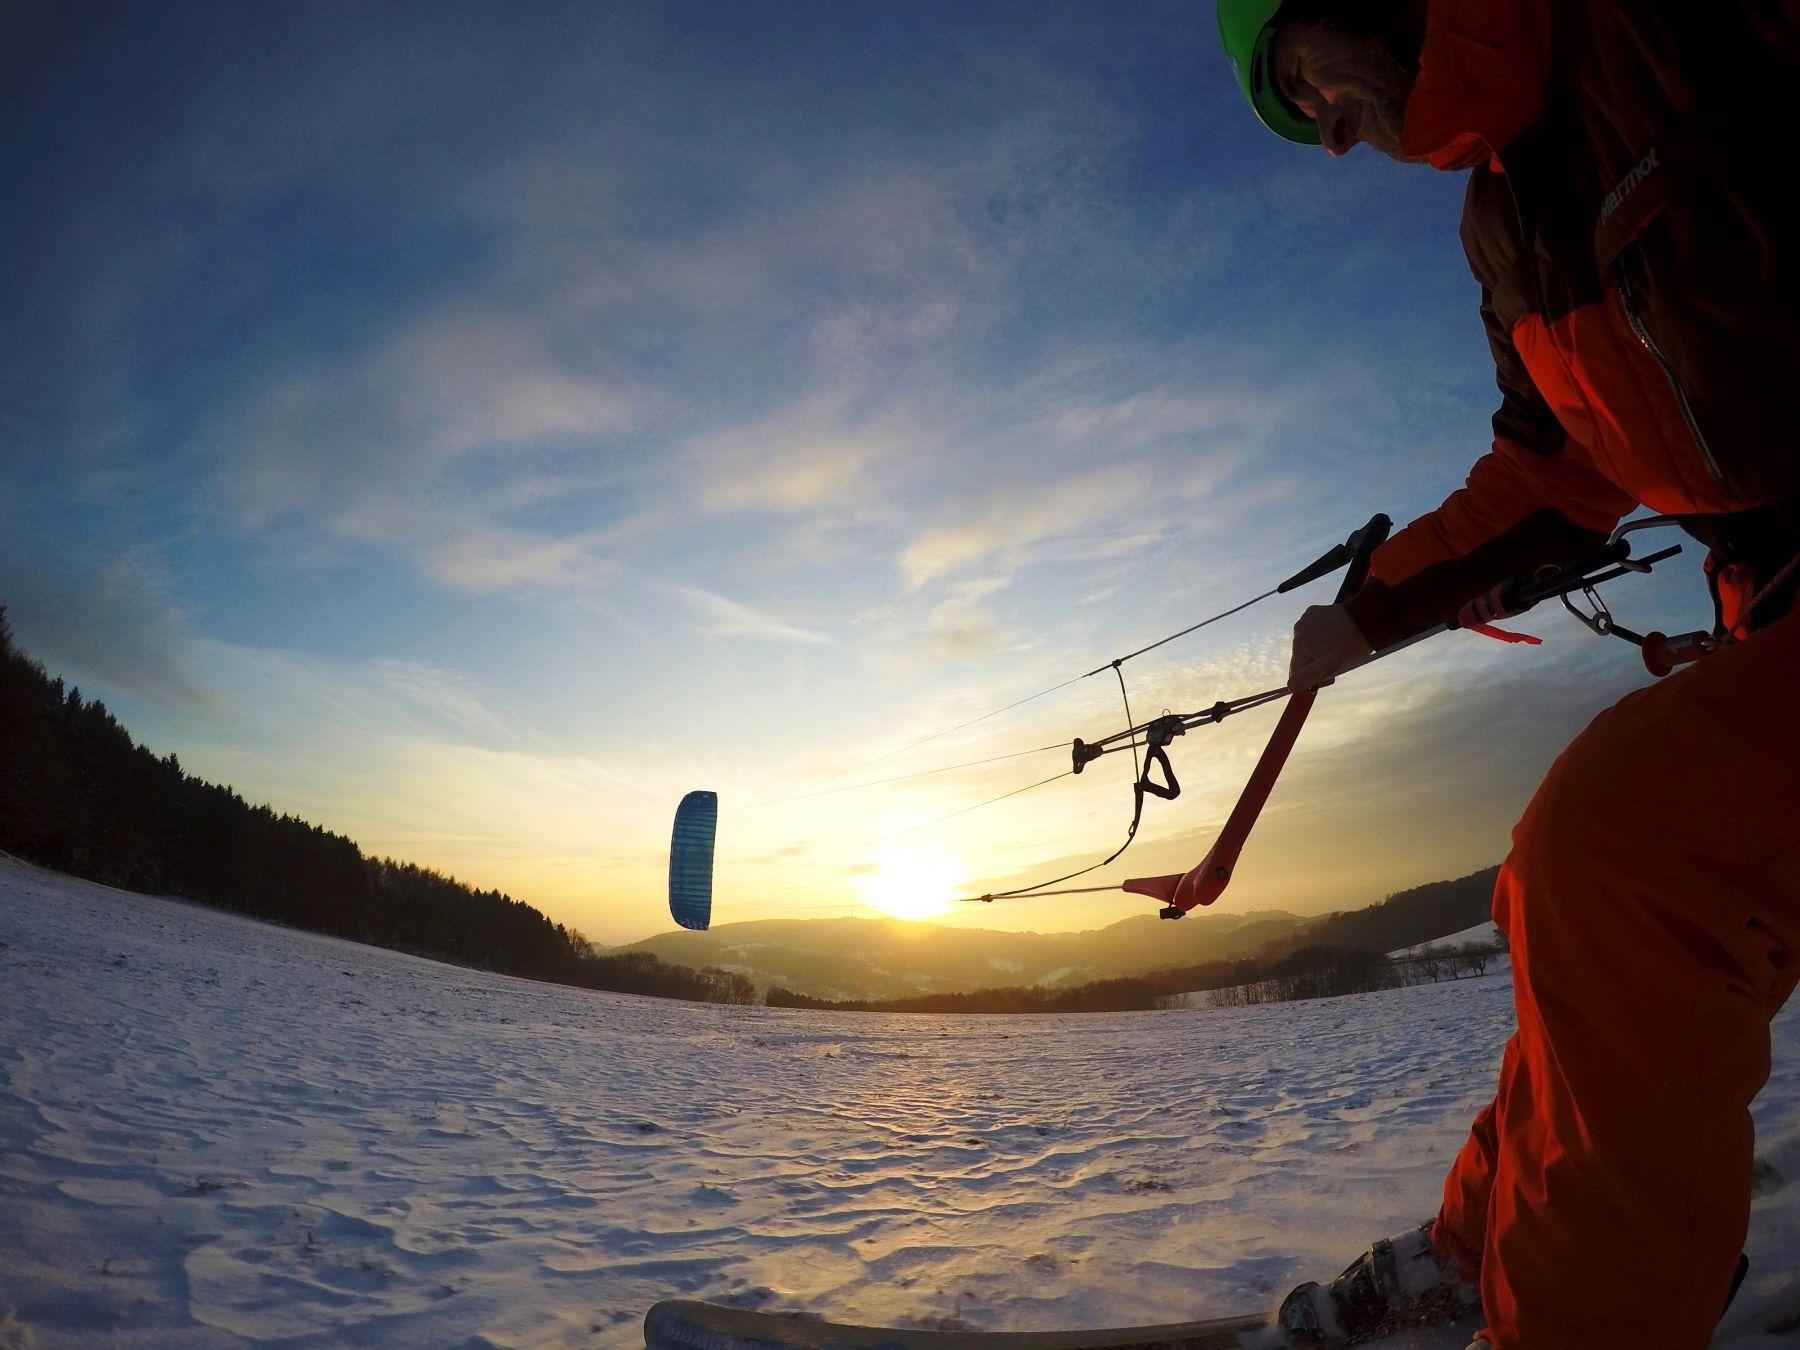 HQ4kites_Montana_x_snowkite-odenwald